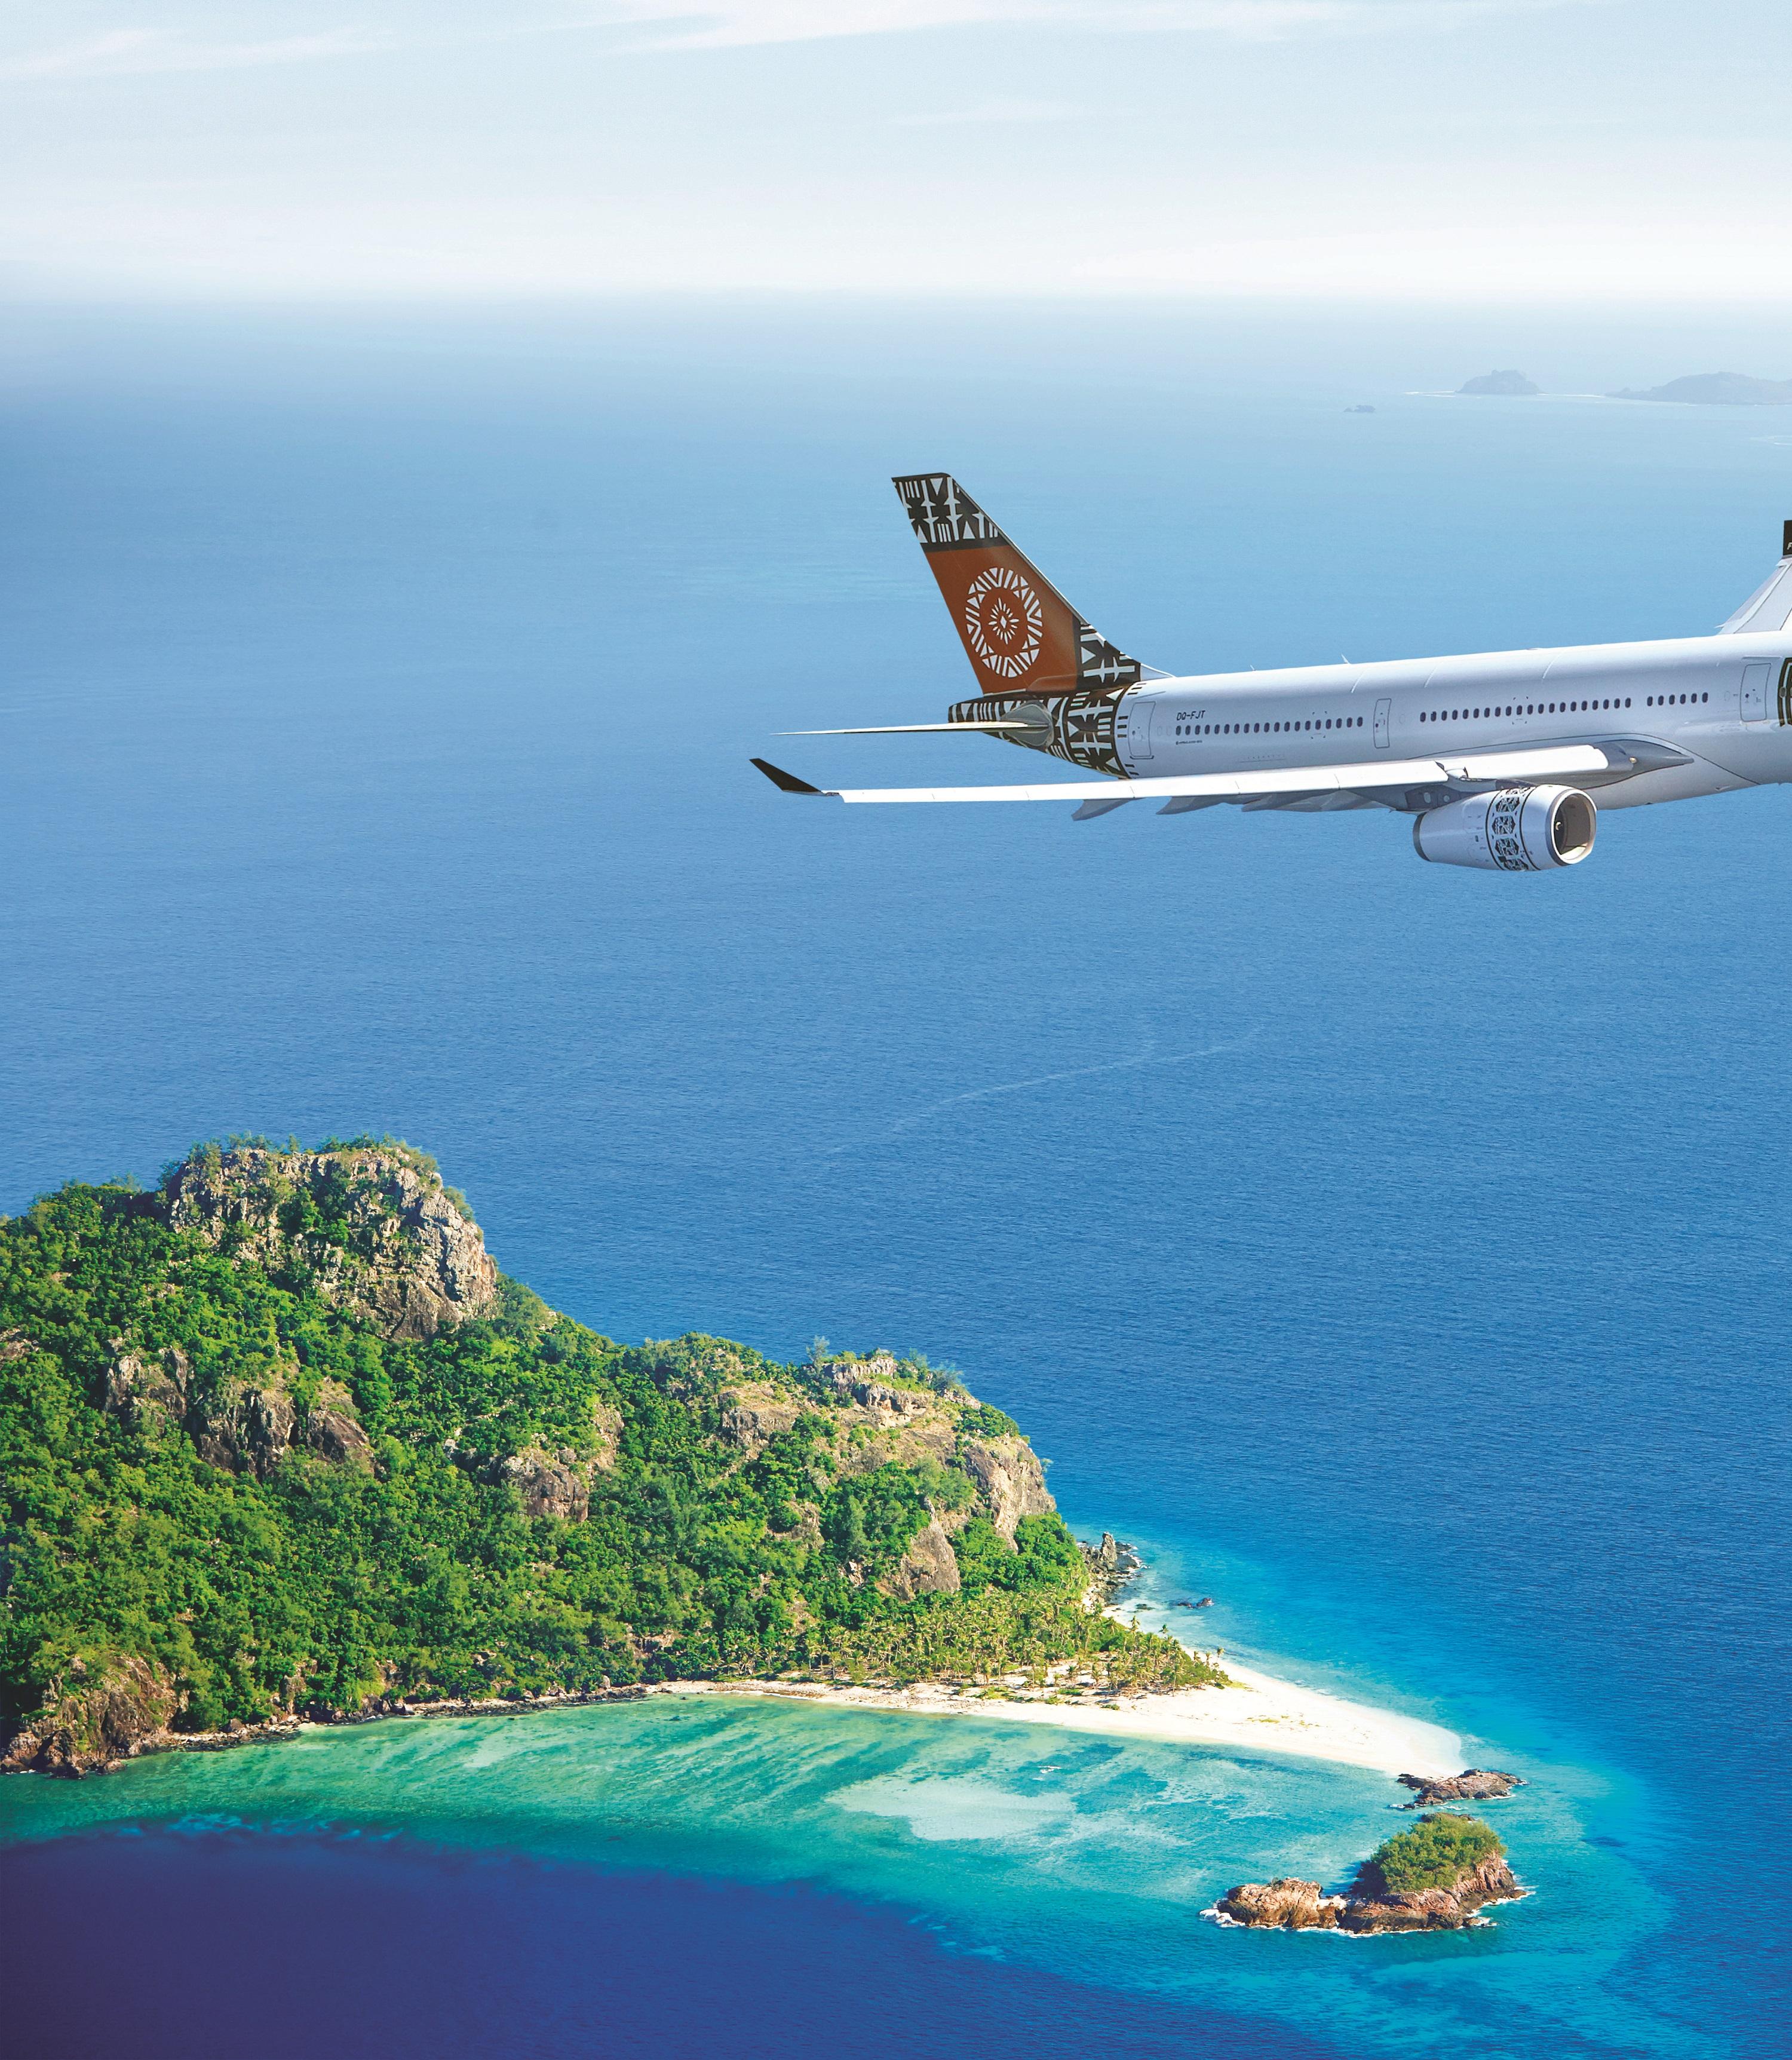 Christchurch Airport welcomes Fiji Airways' third permanent service between Christchurch and Nadi